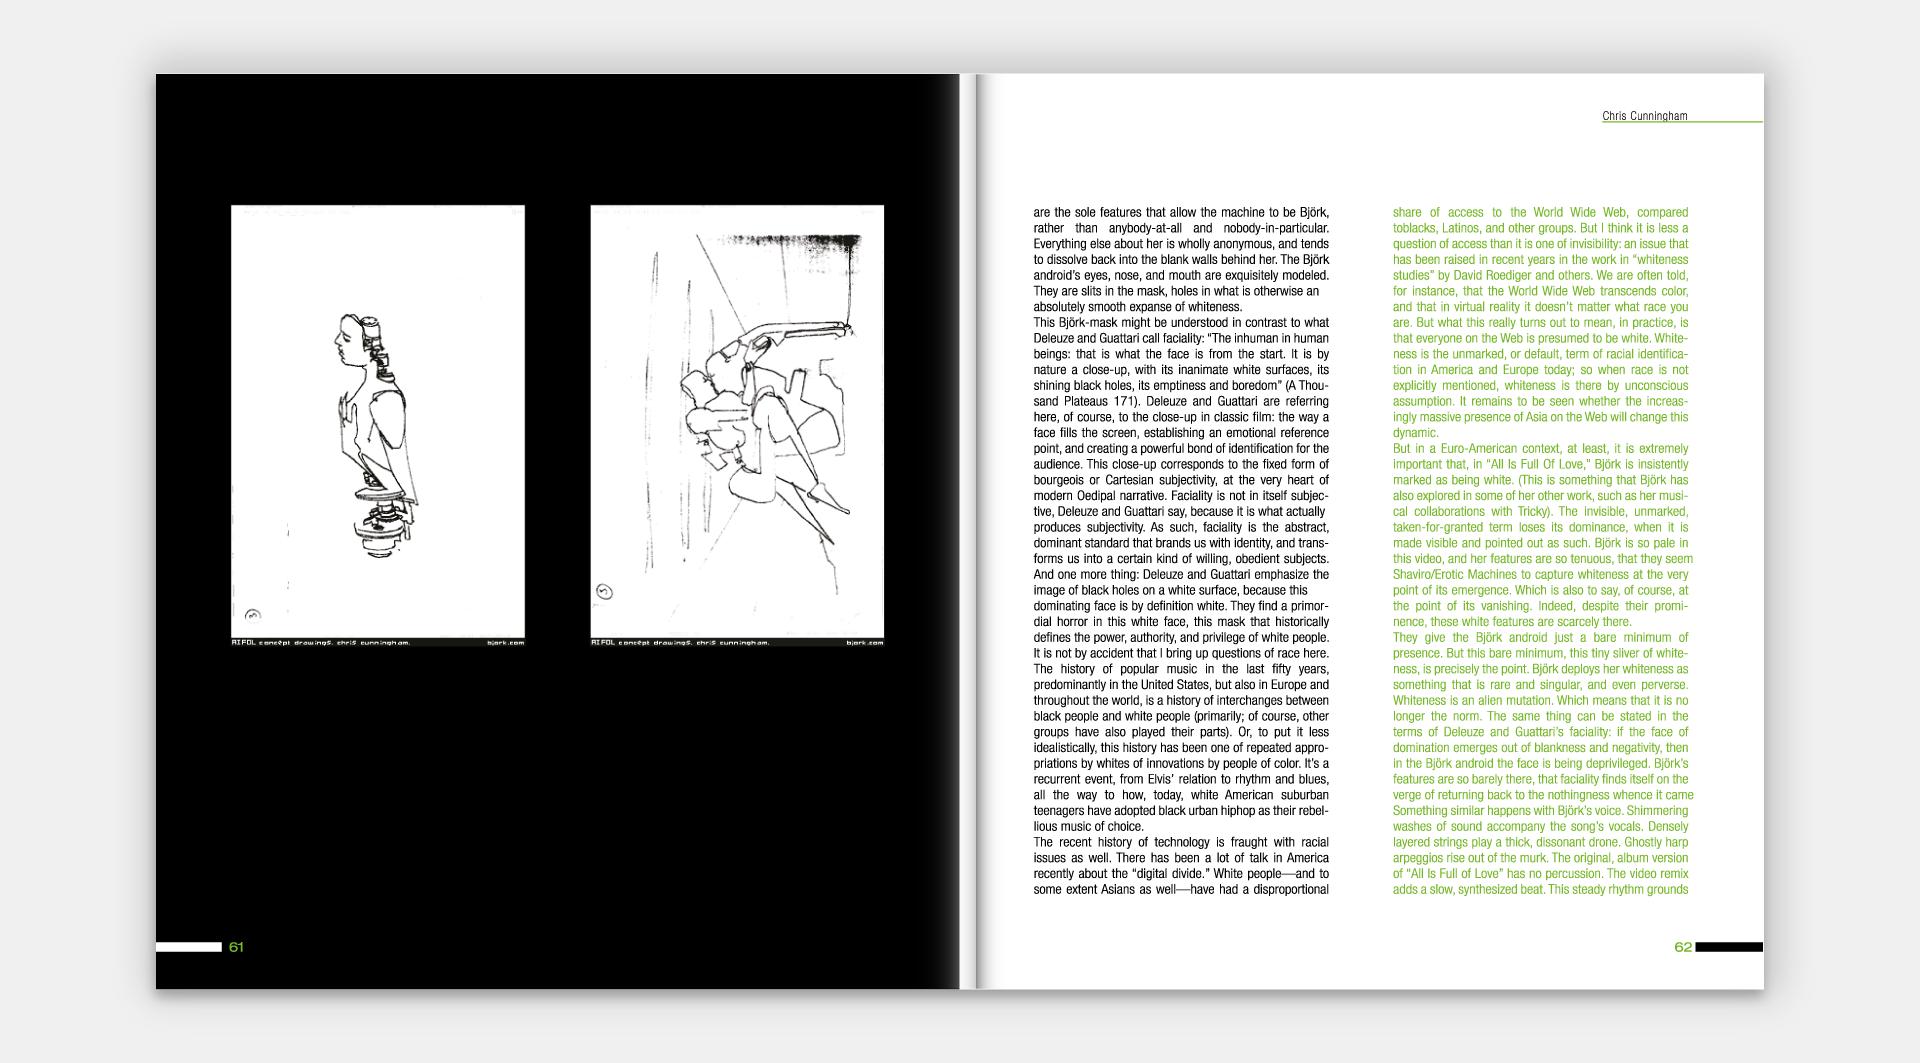 Seite 59-60